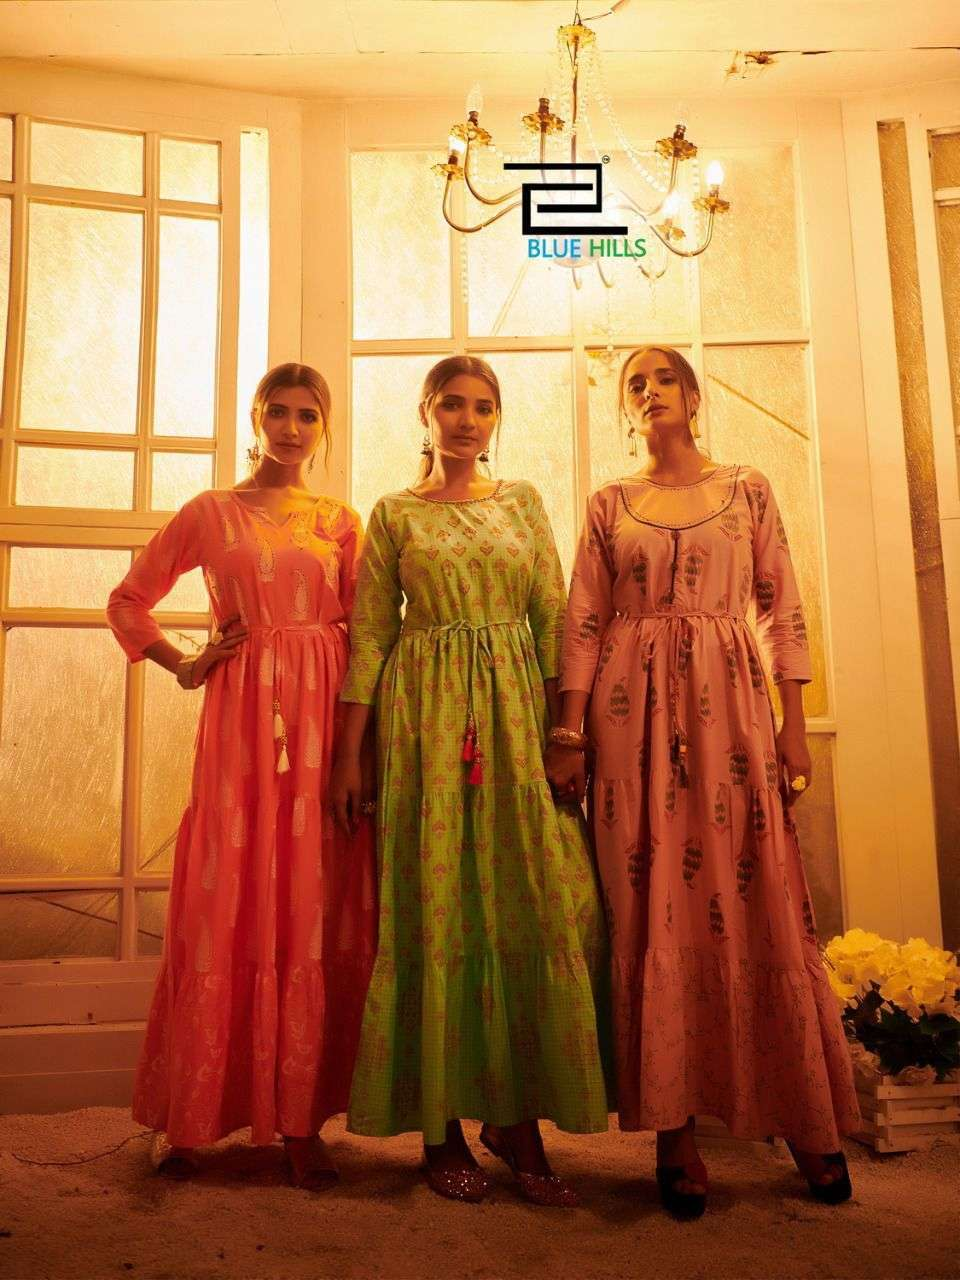 blue hills trend 4 you series 101-106 premium cotton cambric print kurti